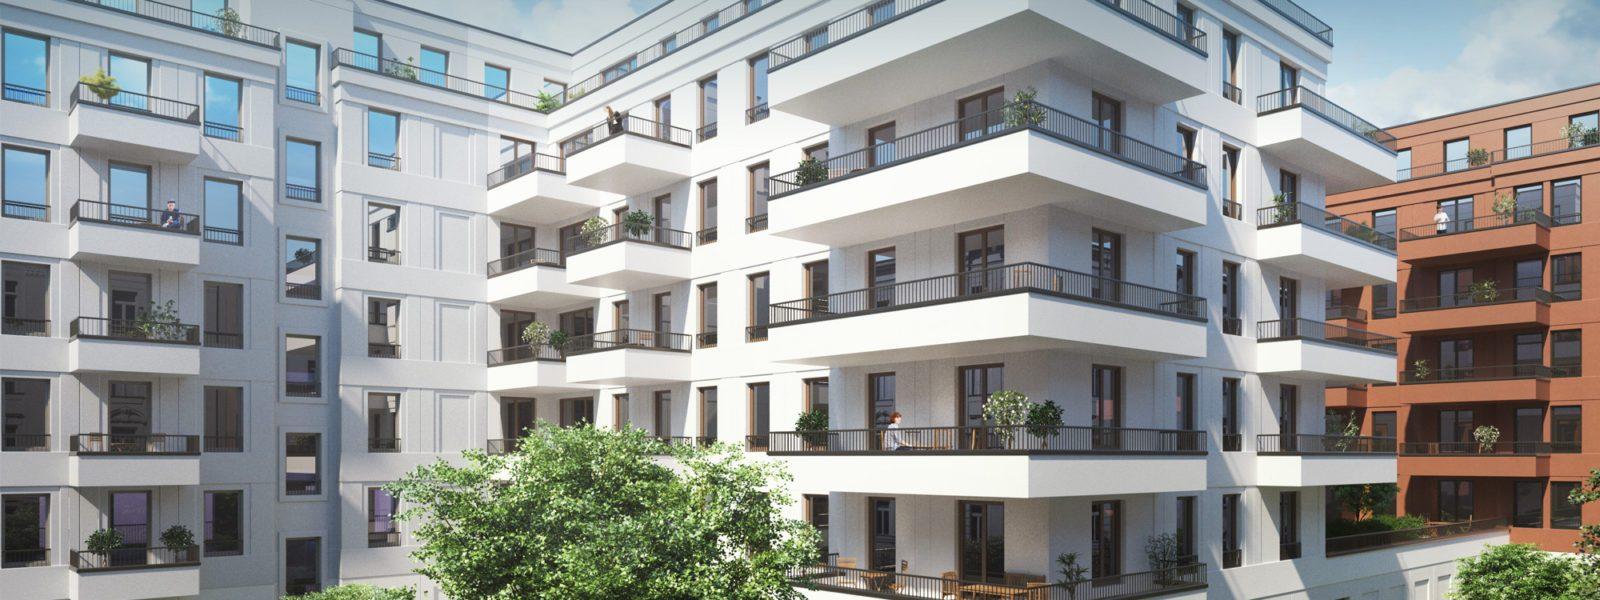 The Gent 40: One Bedroom Apartment in Premium Location